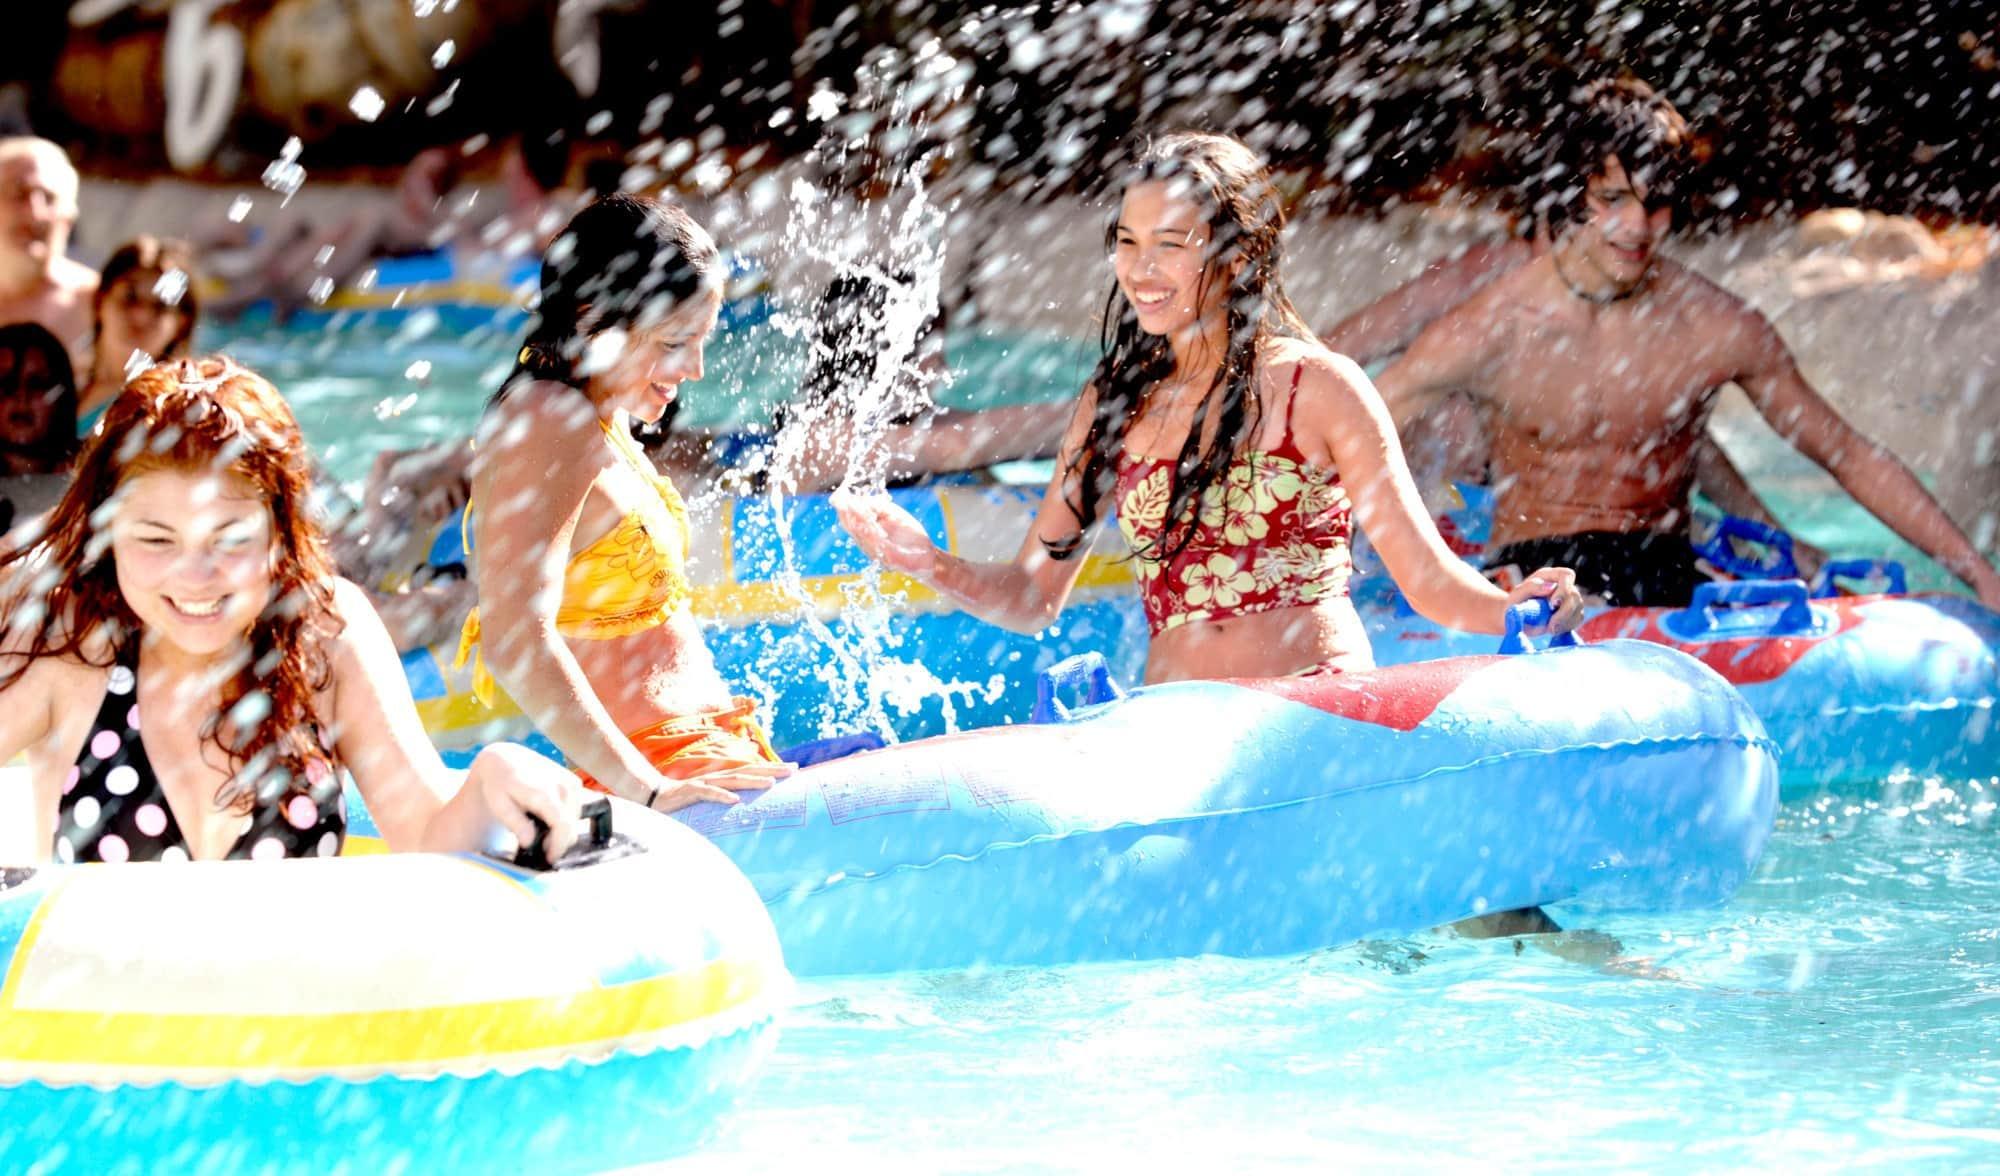 Plan a day at Typhoon Lagoon with teens and tweens ~ Disney World with Teens & Tweens